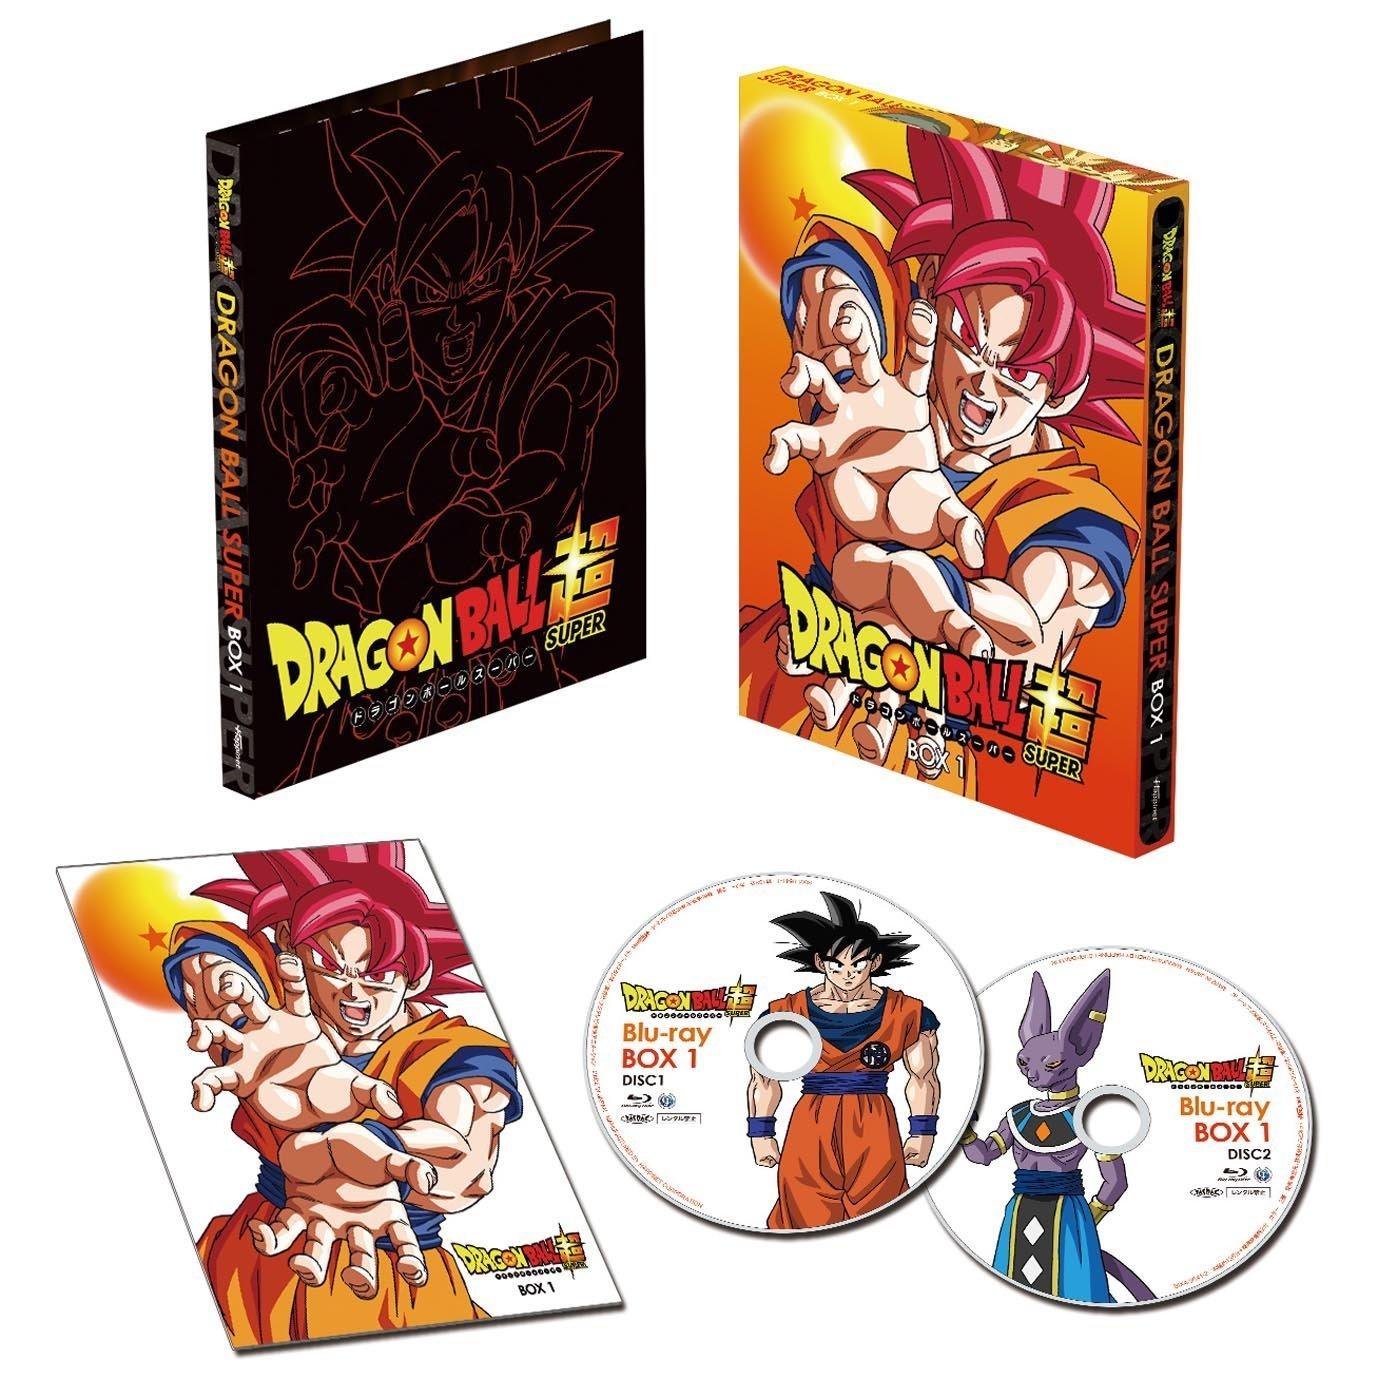 Anime, Movies, Comics, Entertainment & MoreThird 'Dragon Ball Super' Anime DVD/BD Box Set Packaging Revealed